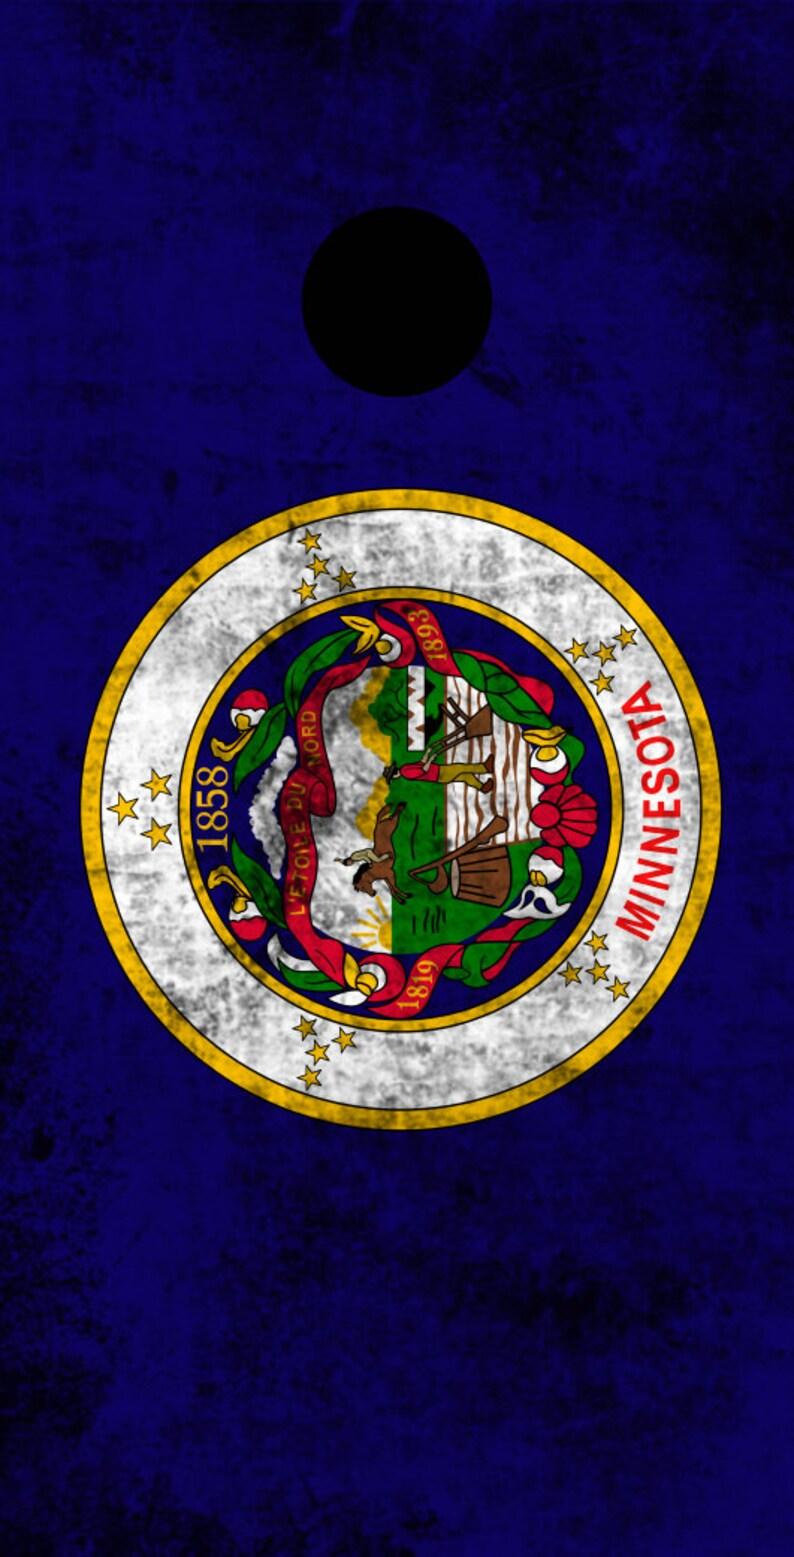 Corn Toss Worn State Flag FREE SHIPPING Custom Corn Hole Wraps Themed Cornhole Board Prints Minnesota Bag Toss